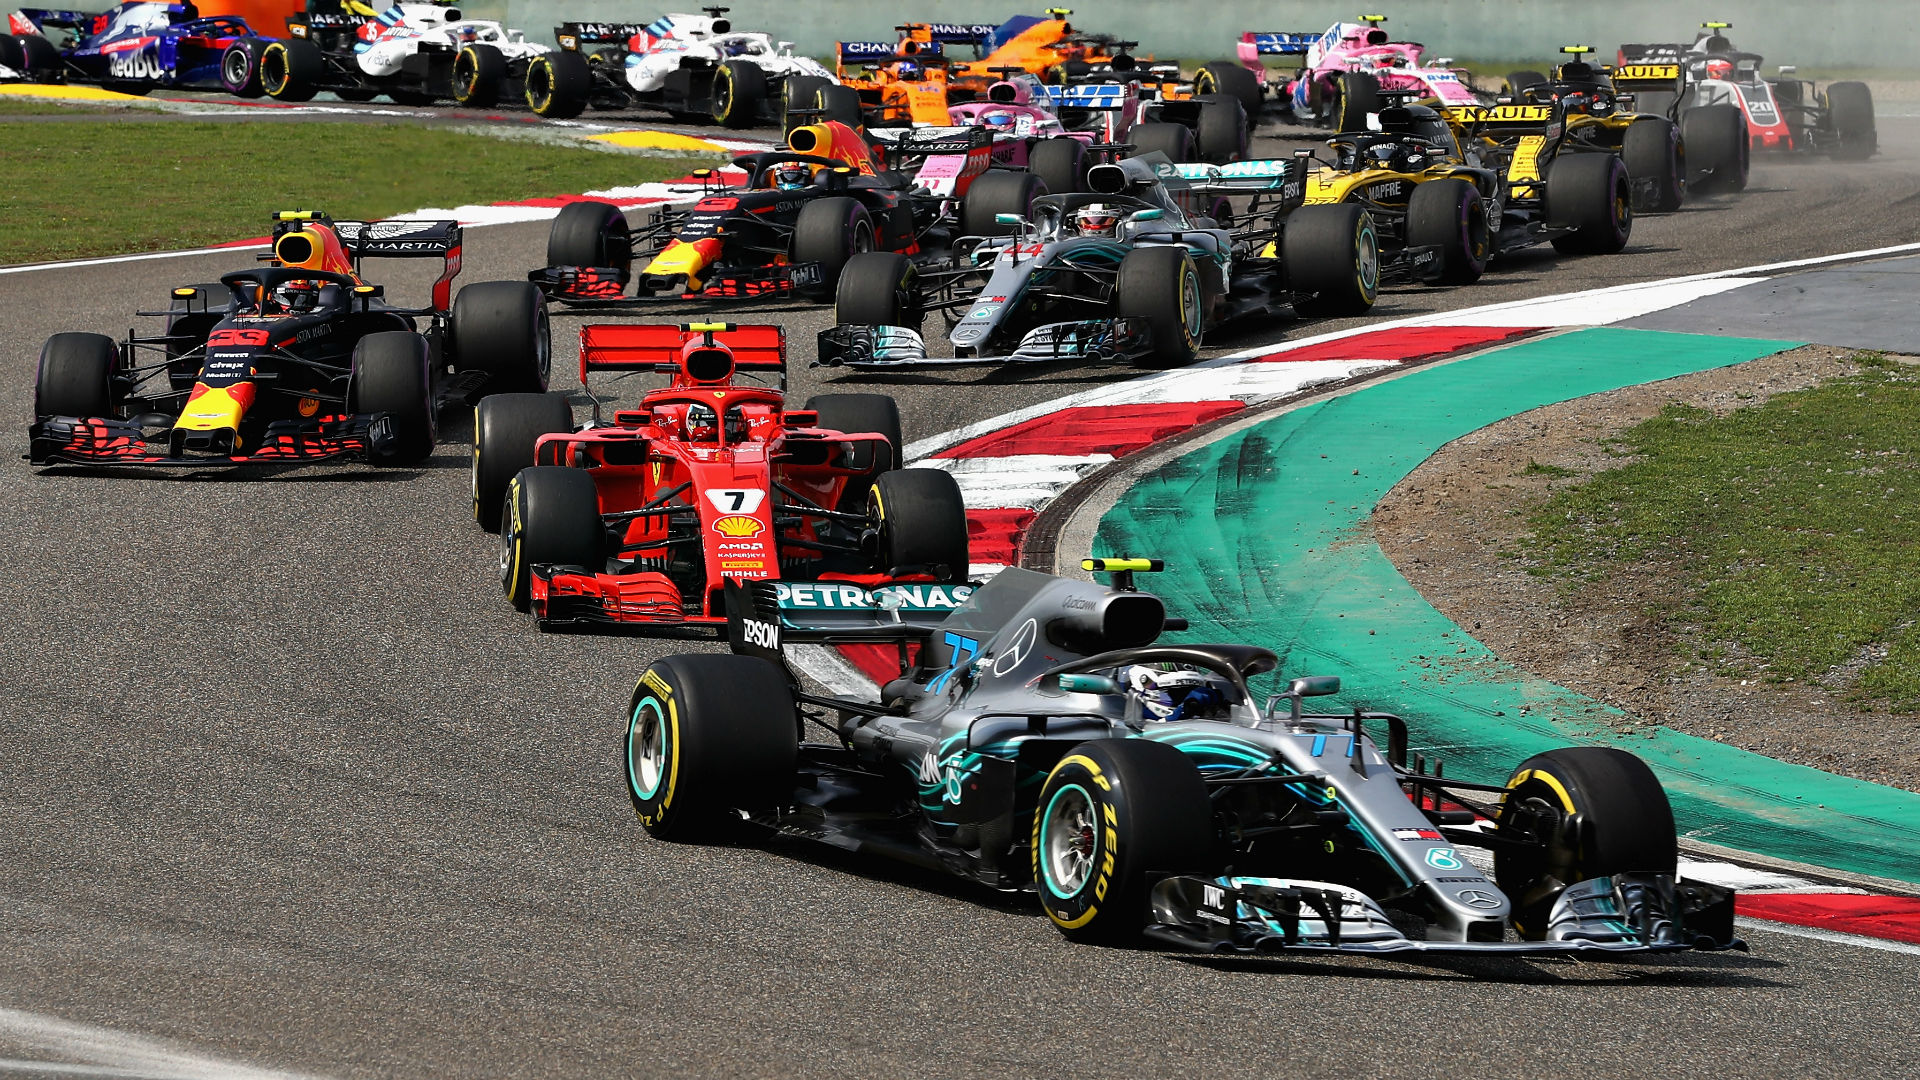 F1 Racing betting